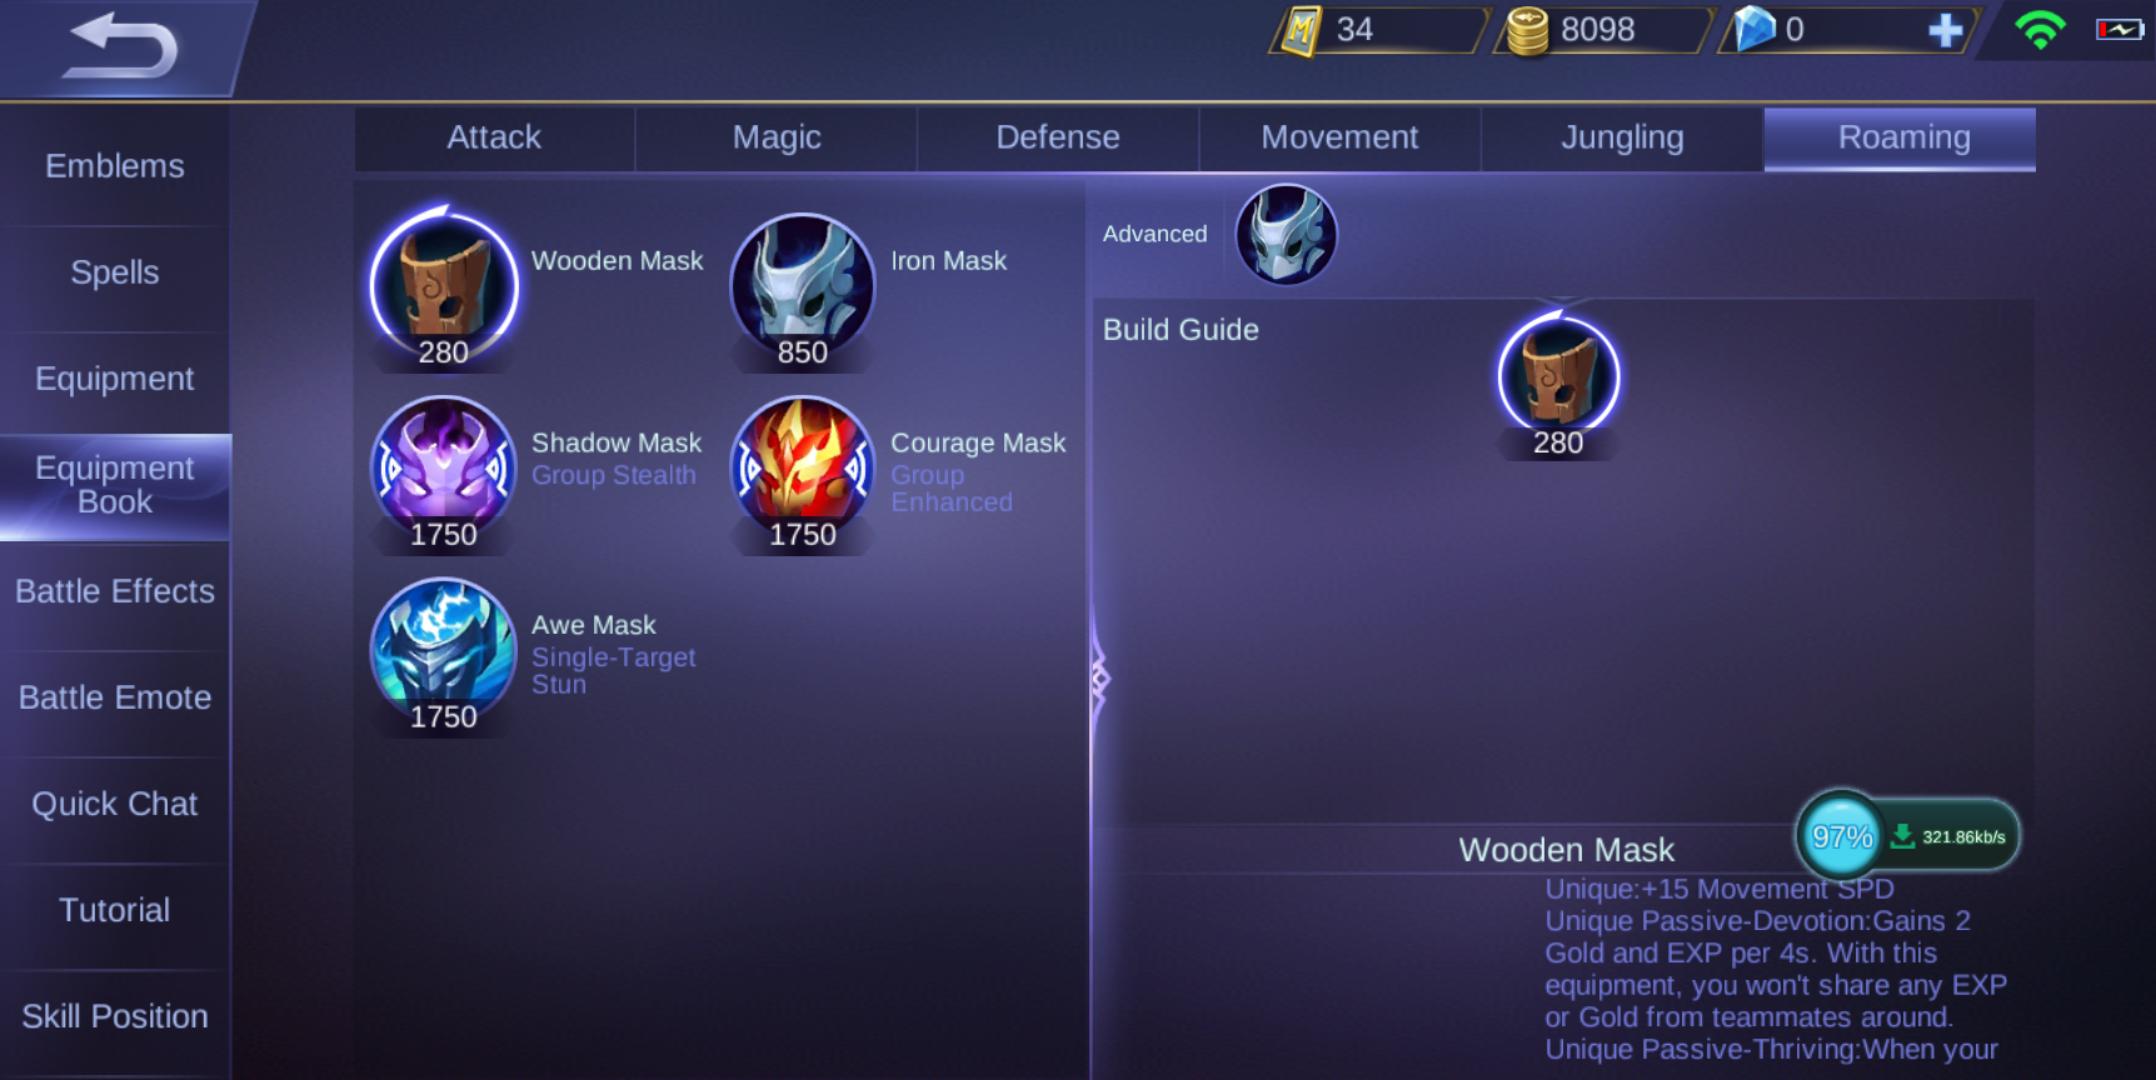 Hasil gambar item baru, yaitu Wooden mask, iron mask, shadow mask, courage mask dan awe mask.